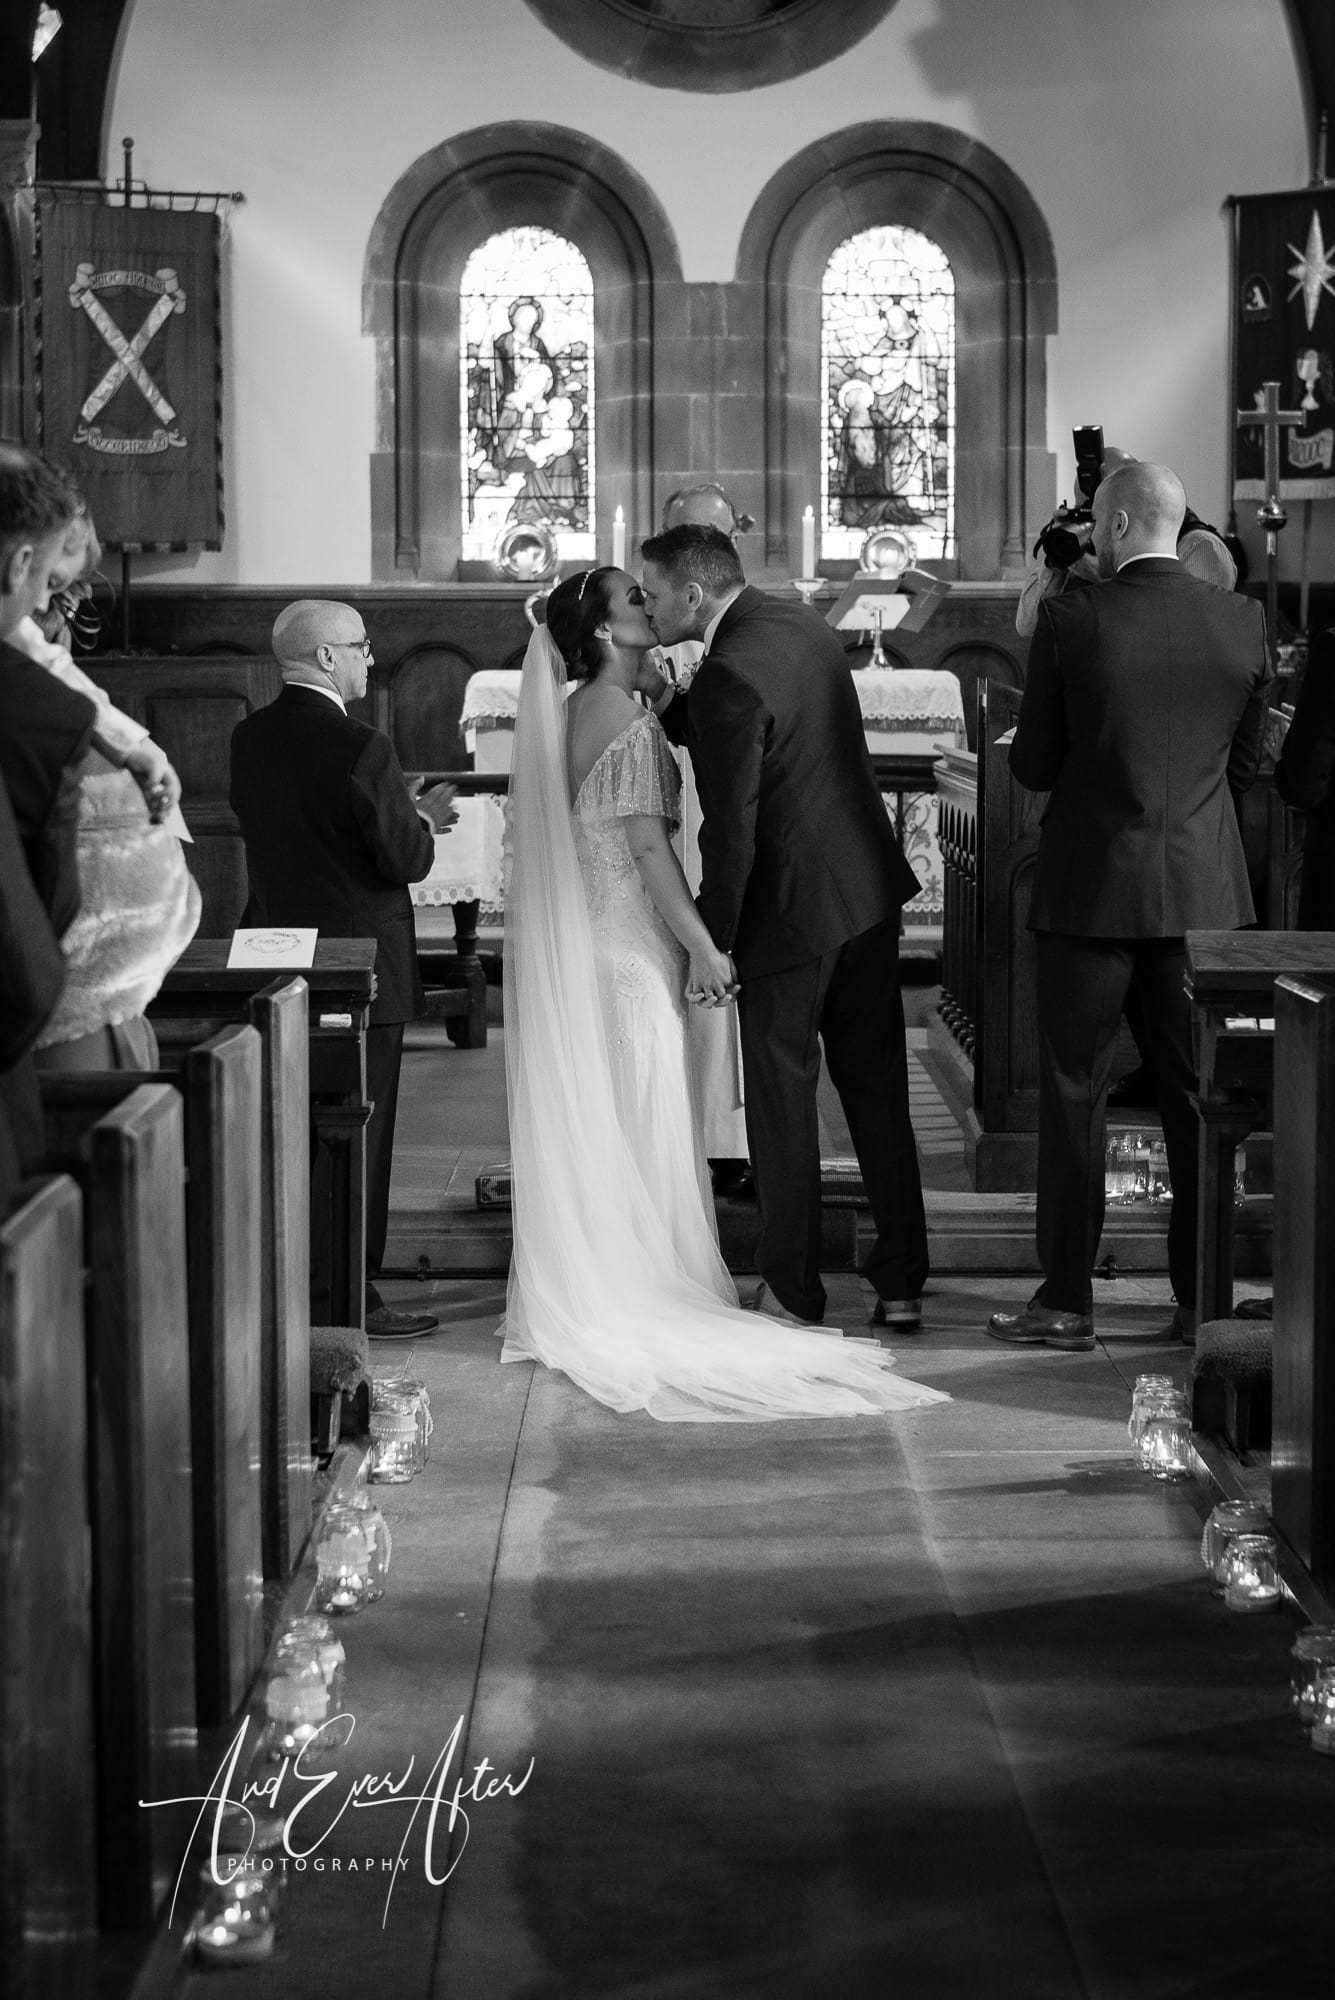 bride, groom, wedding day, love